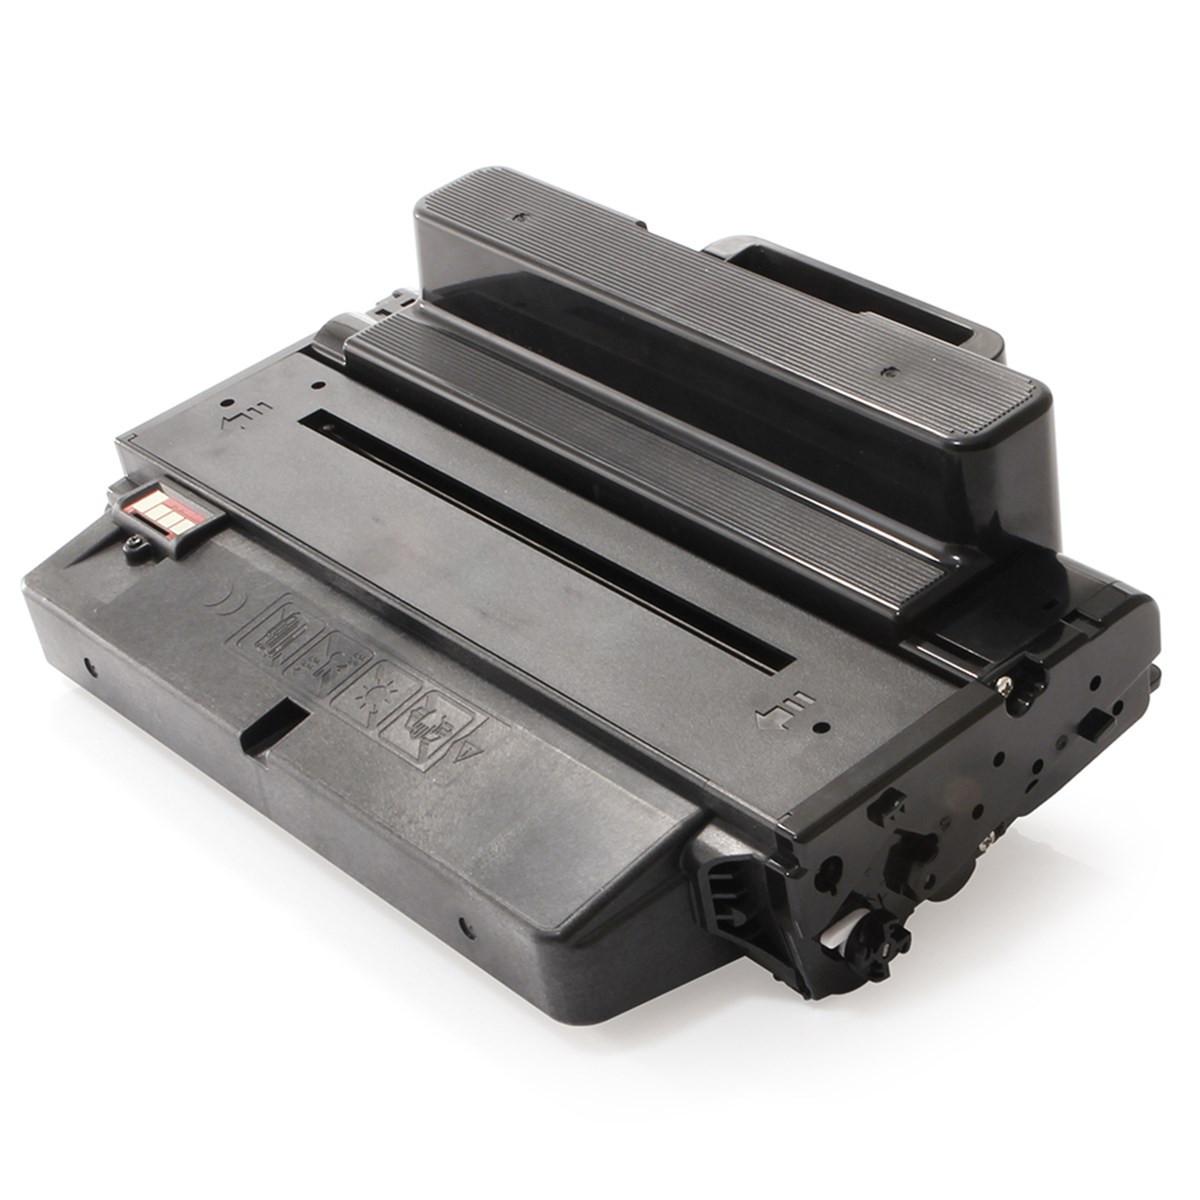 Toner Compatível com Samsung MLT-D205 MLT-D205L | ML3310 SCX4833 ML3310ND SCX4833FD | Premium 5k